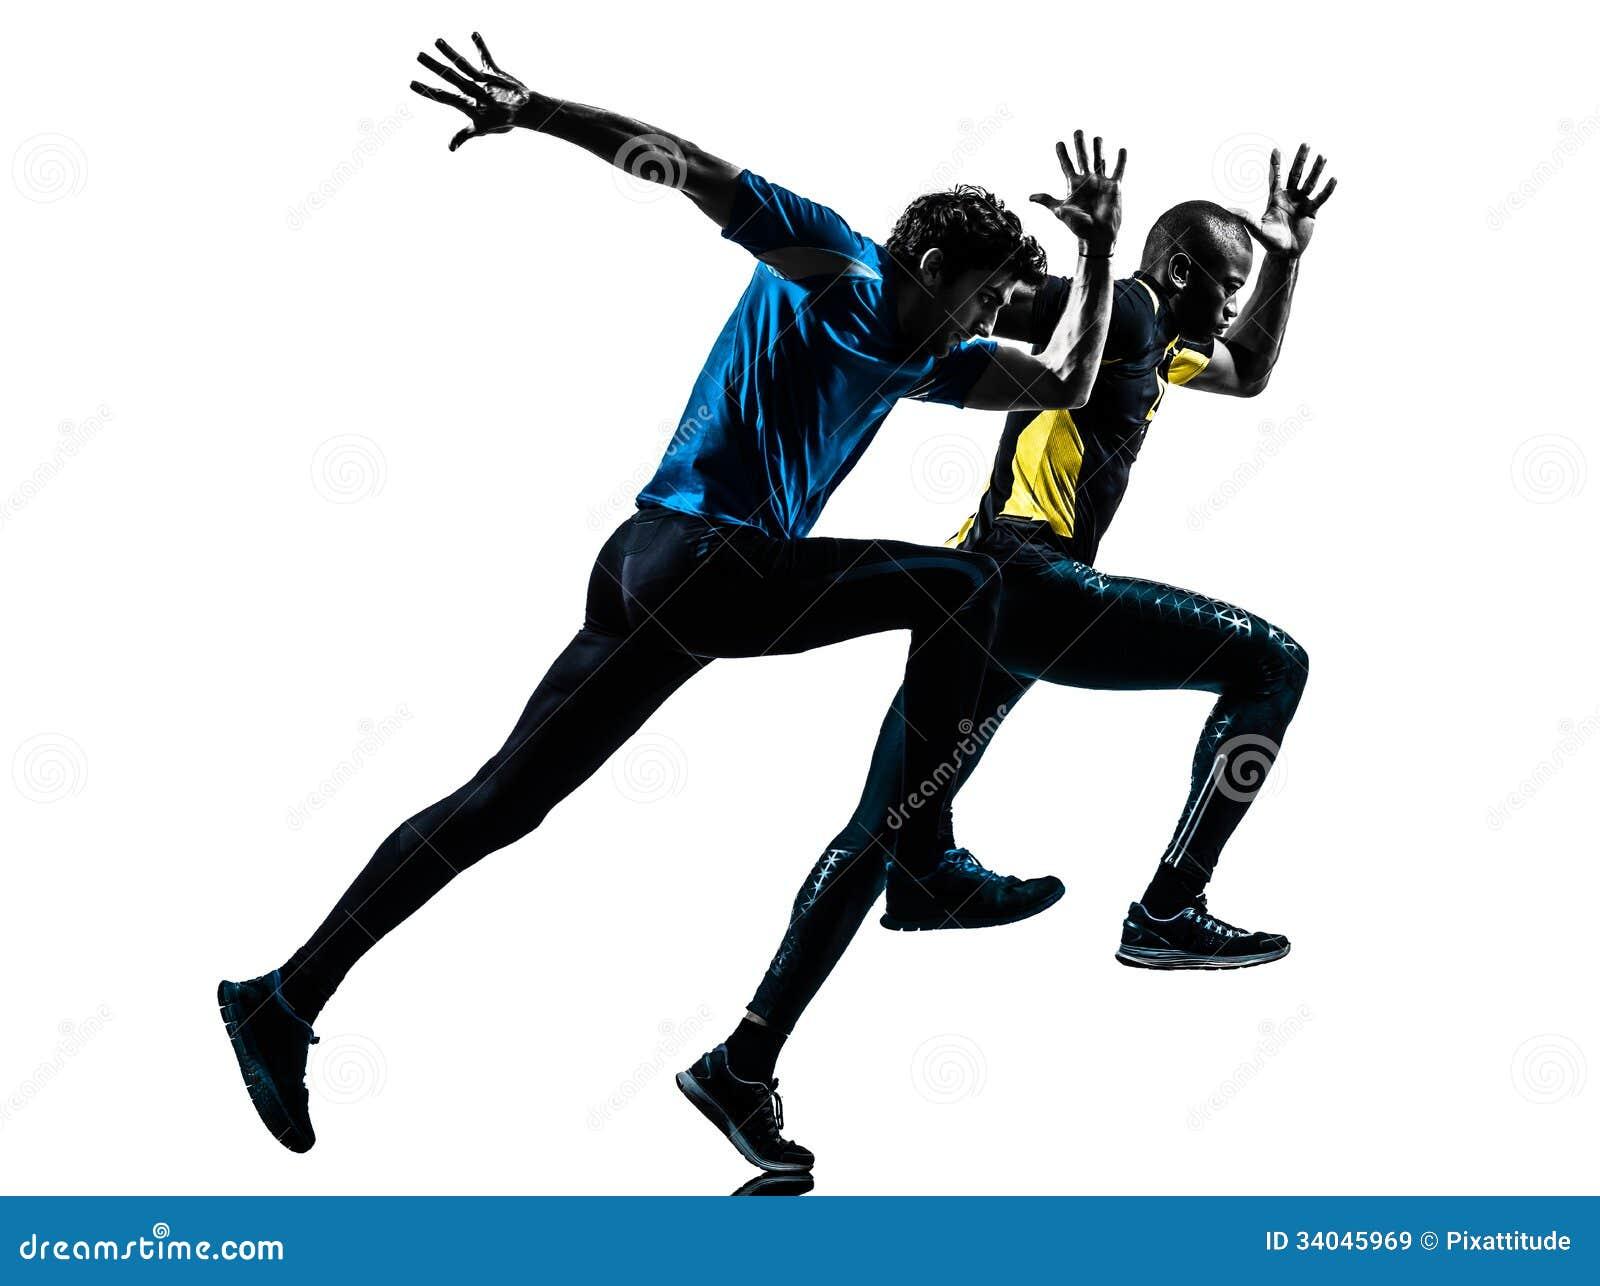 Two Men Racing Runner Sprinter Silhouette